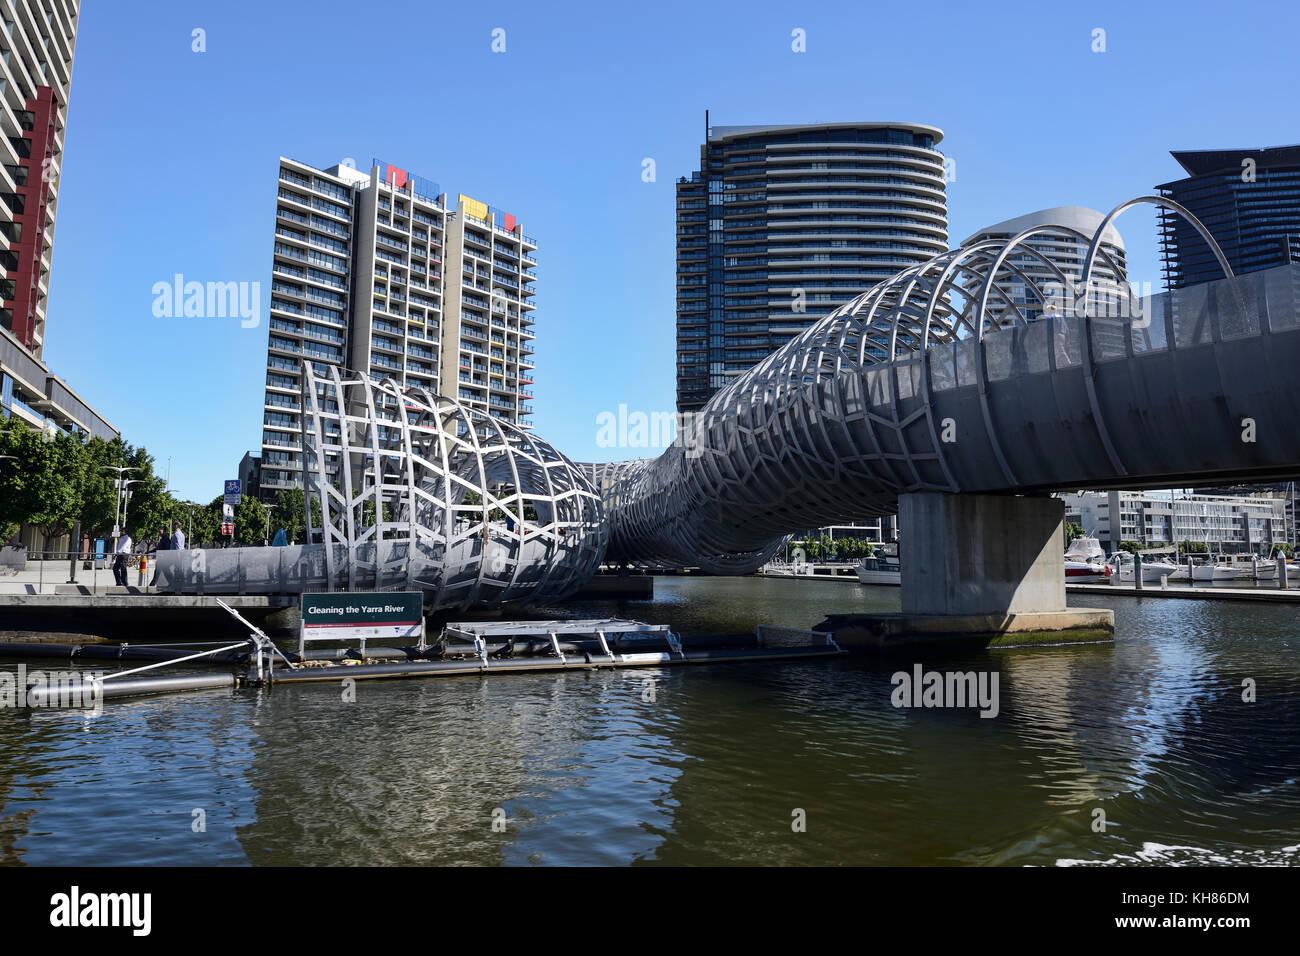 Webb Bridge on Yarra River at Yarra's Edge Marina in Melbourne, Victoria, Australia - Stock Image